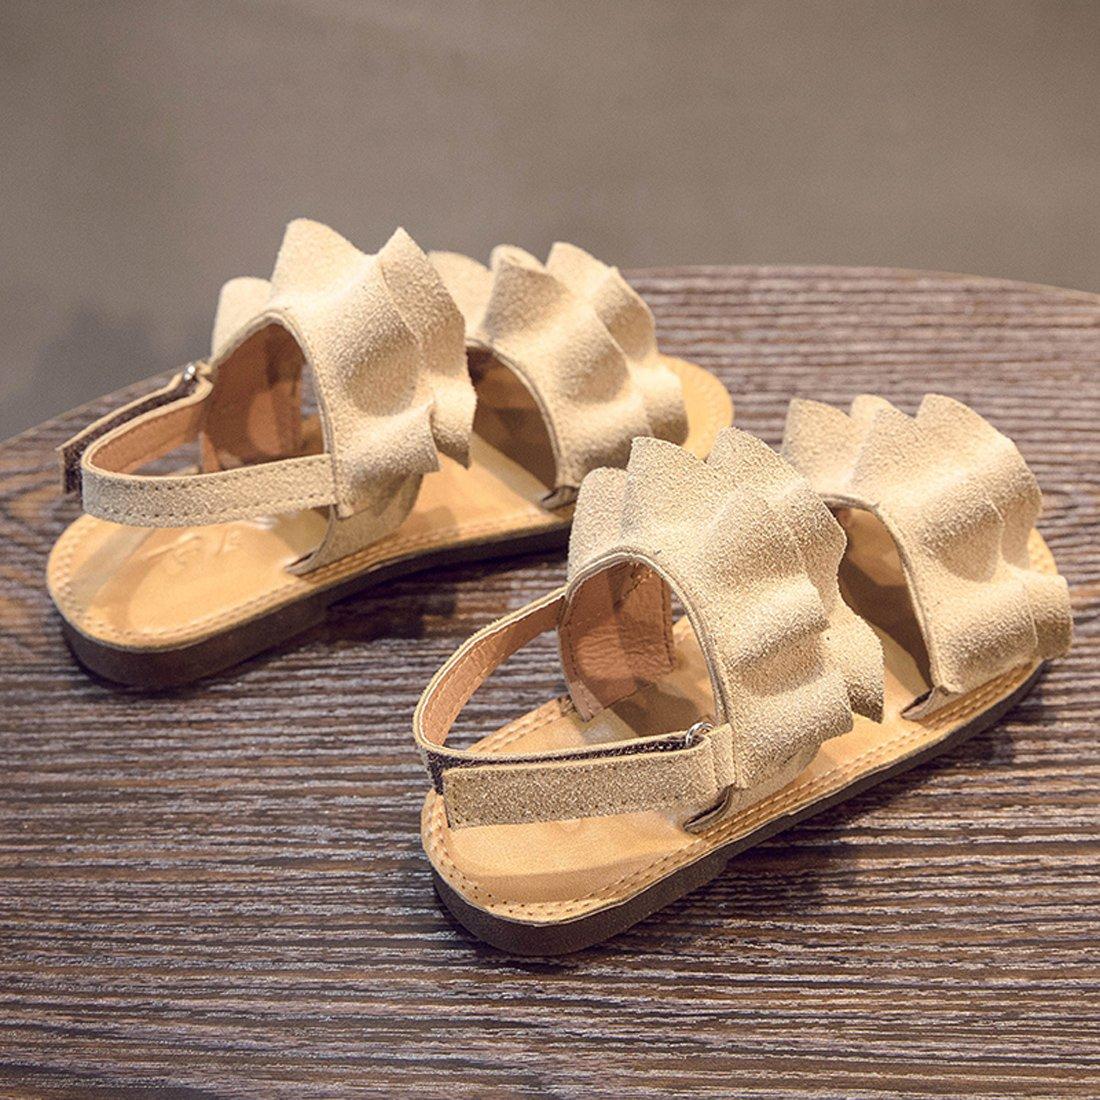 YIBLBOX Kids Toddler Girls Wedding Party Dress Princess Shoes Flats Beach Sandals